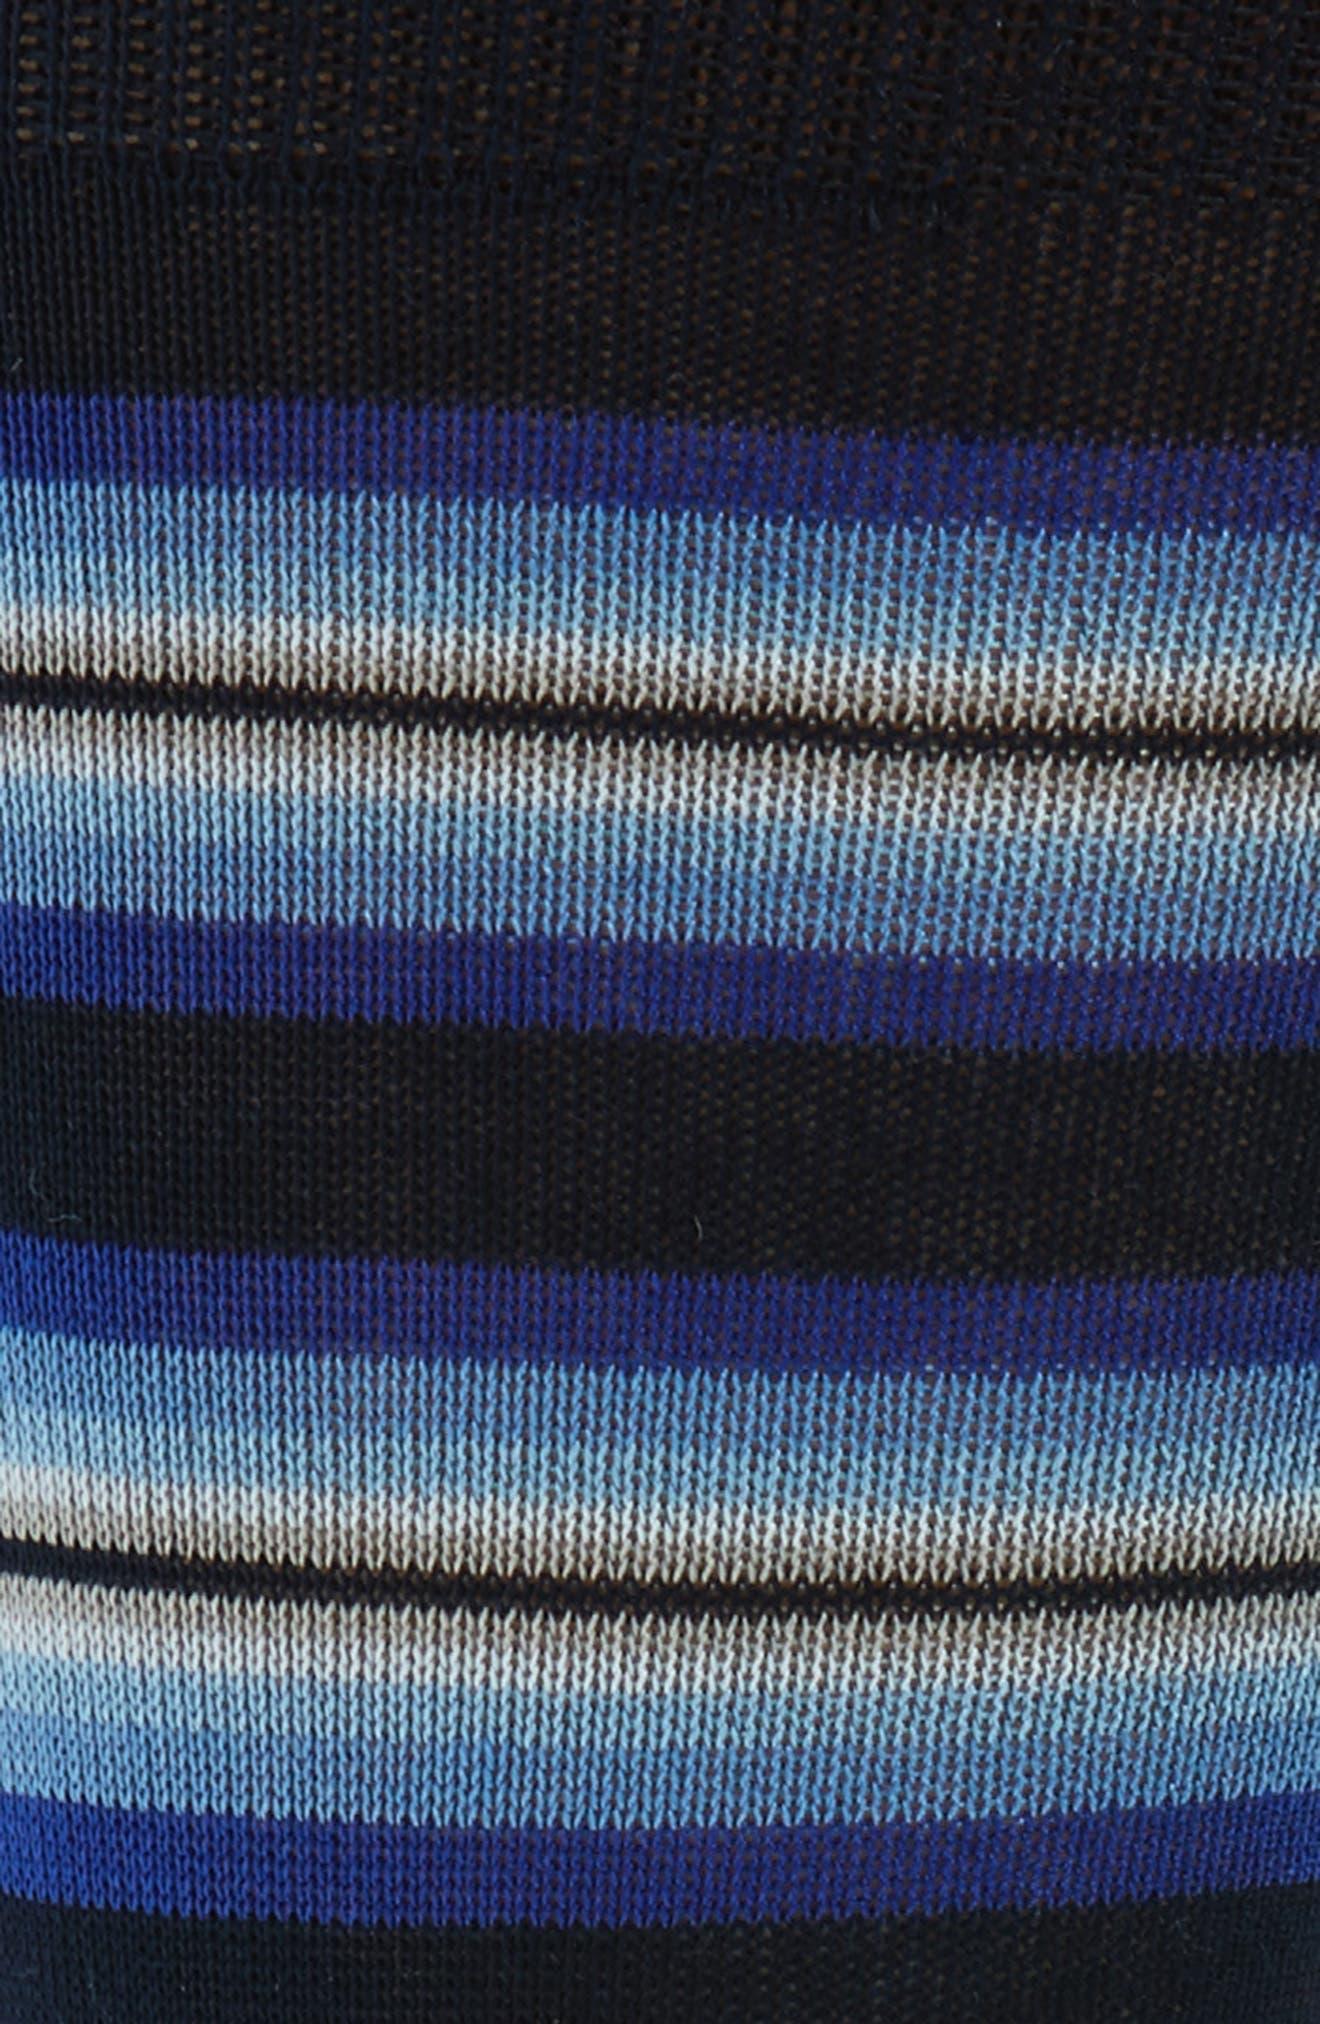 Tiger Stripe Socks,                             Alternate thumbnail 2, color,                             497